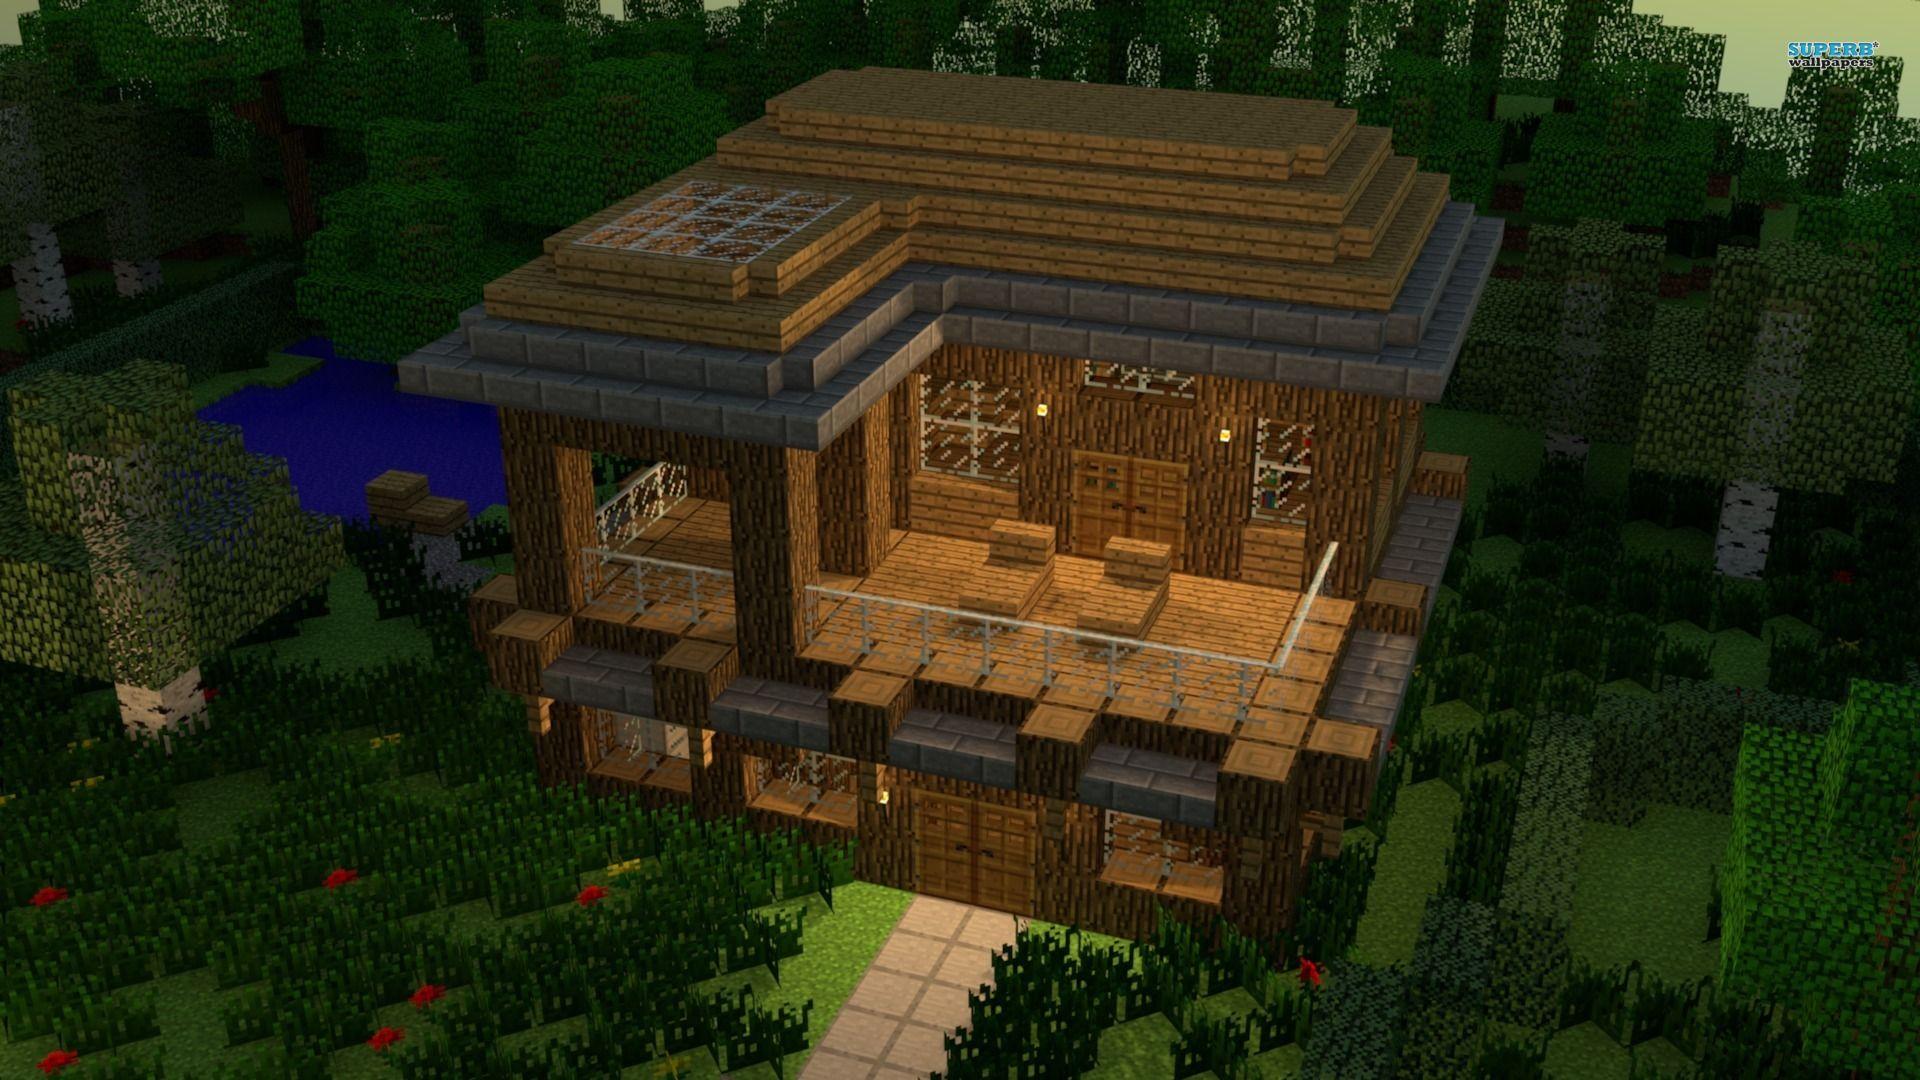 Simple Minecraft Modern House Blueprints 20521 HD Wallpapers